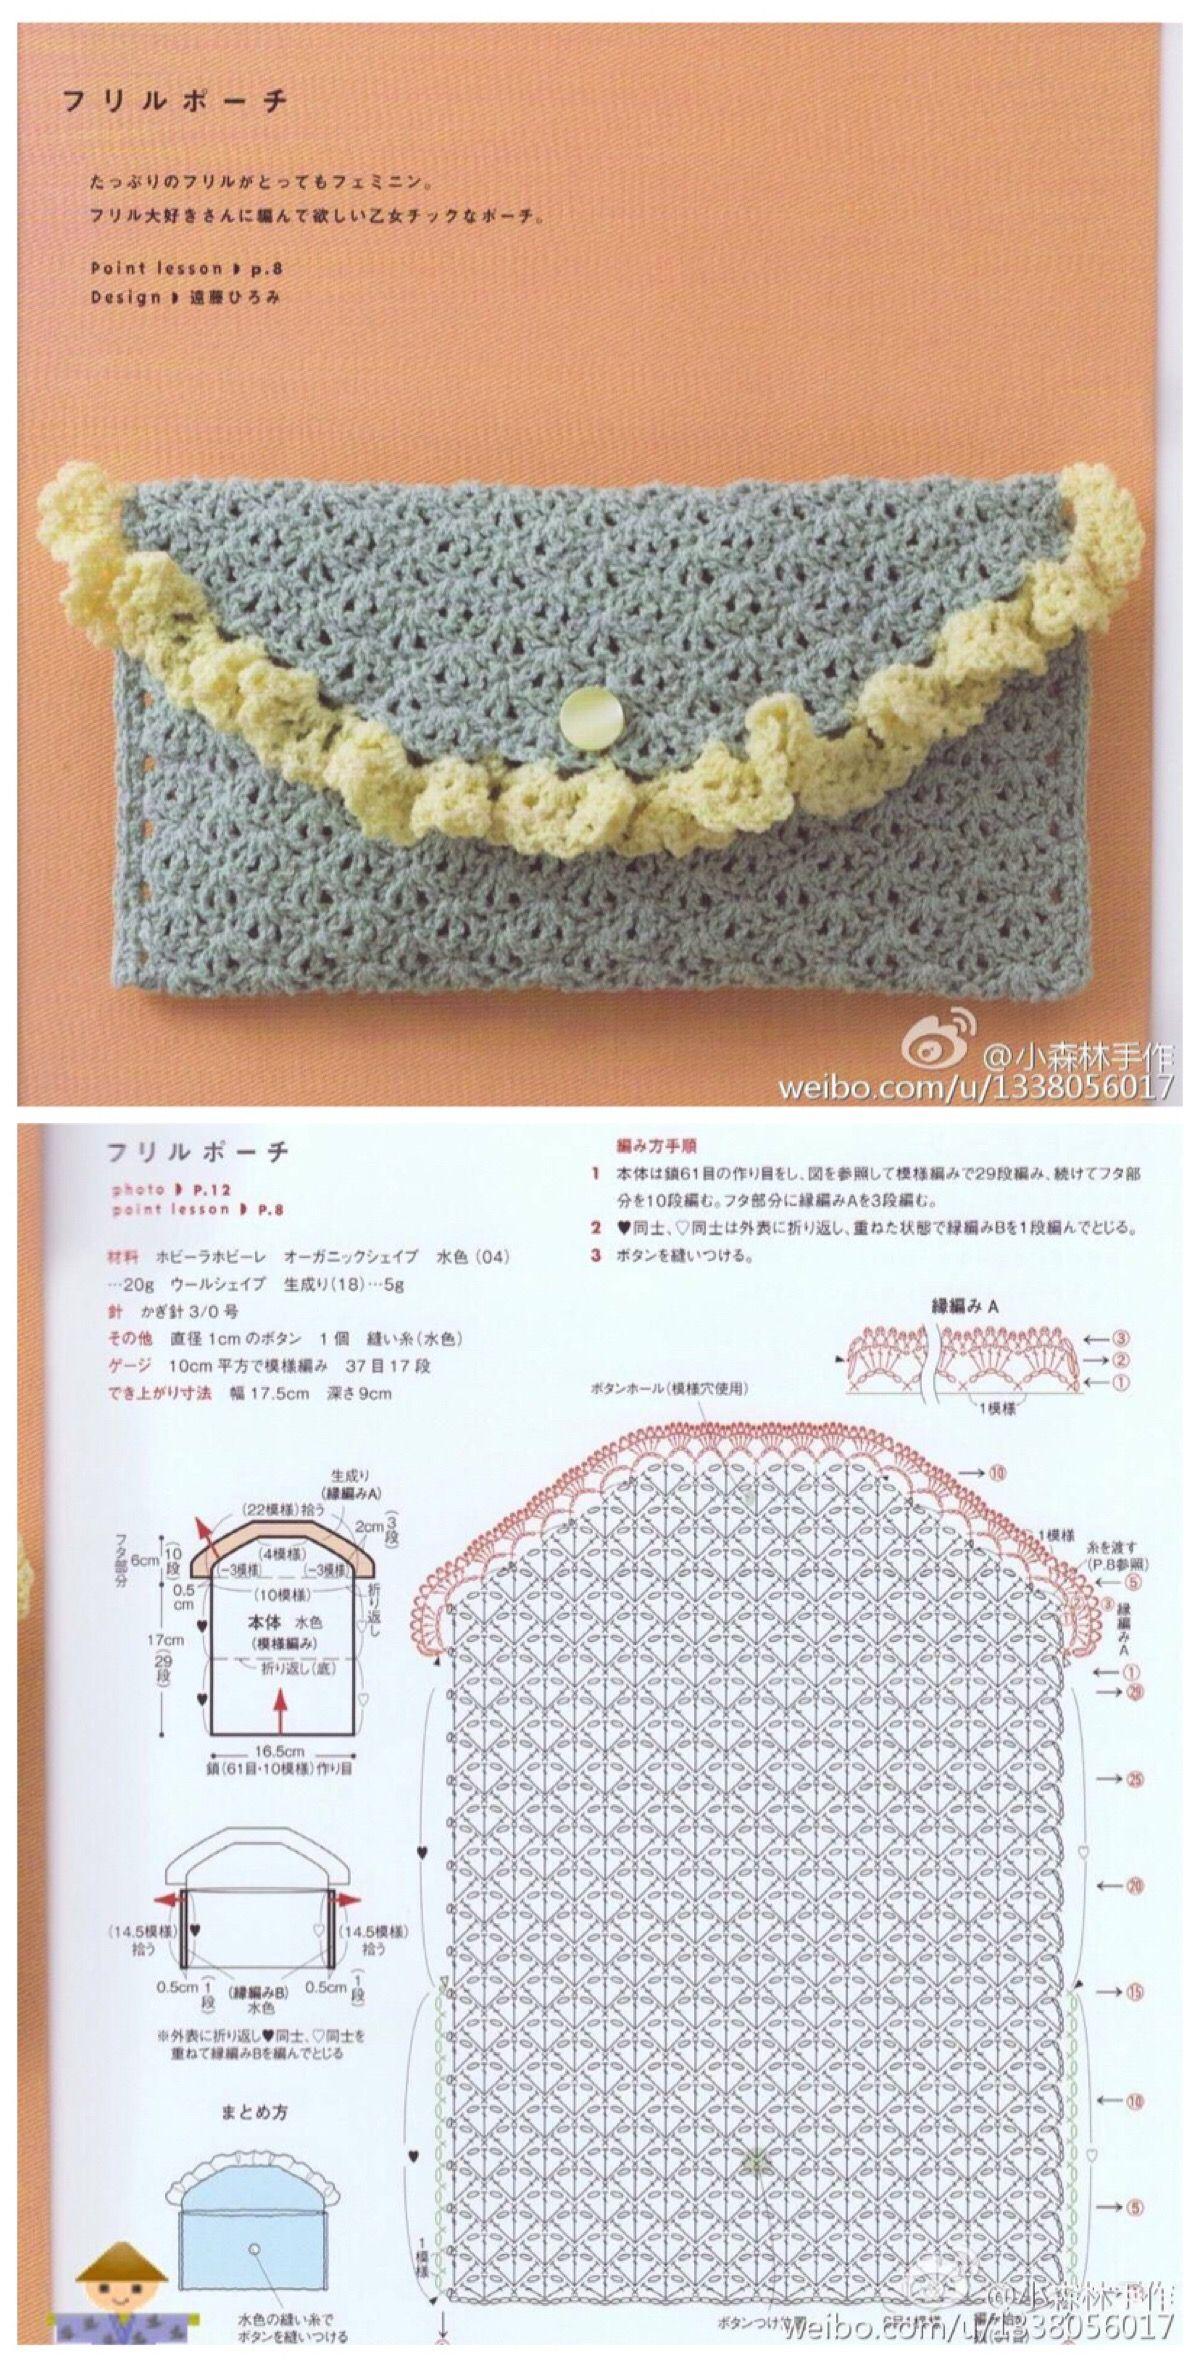 medium resolution of crochet diagram for cute clutch purse